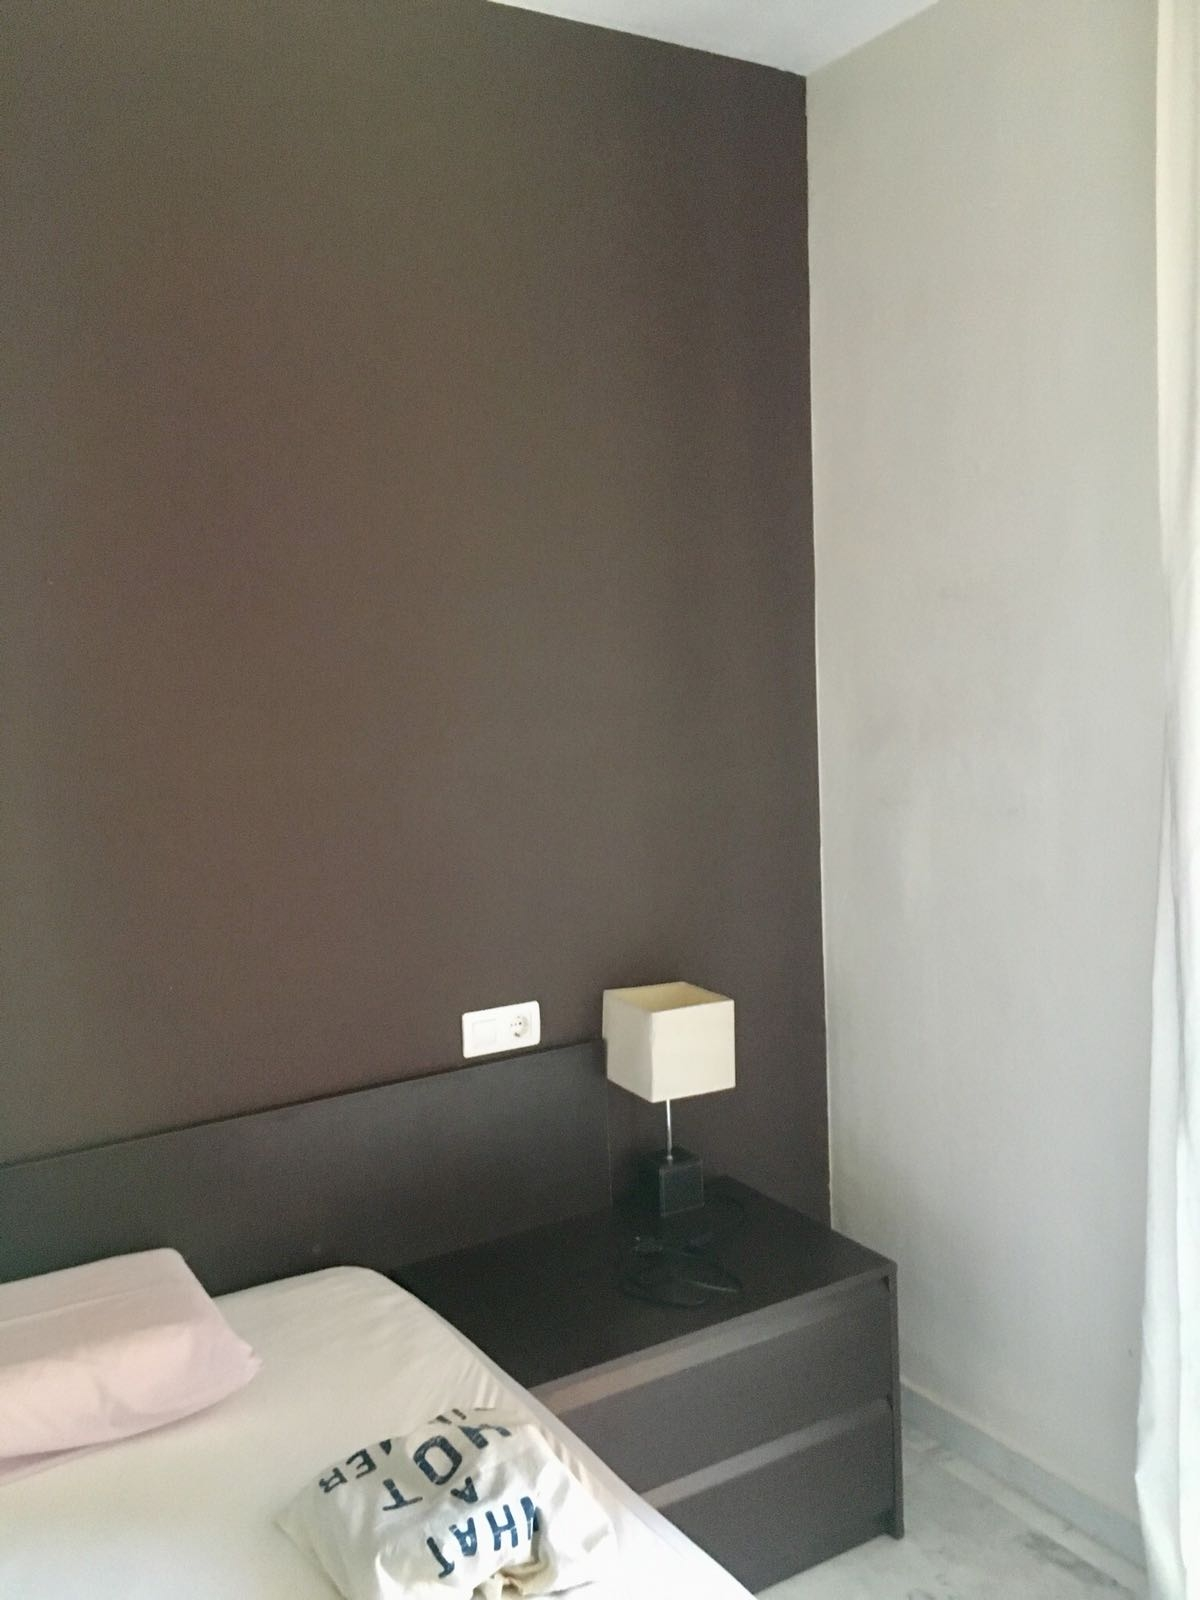 piso venta marbella- dormitorio 1-laurosur